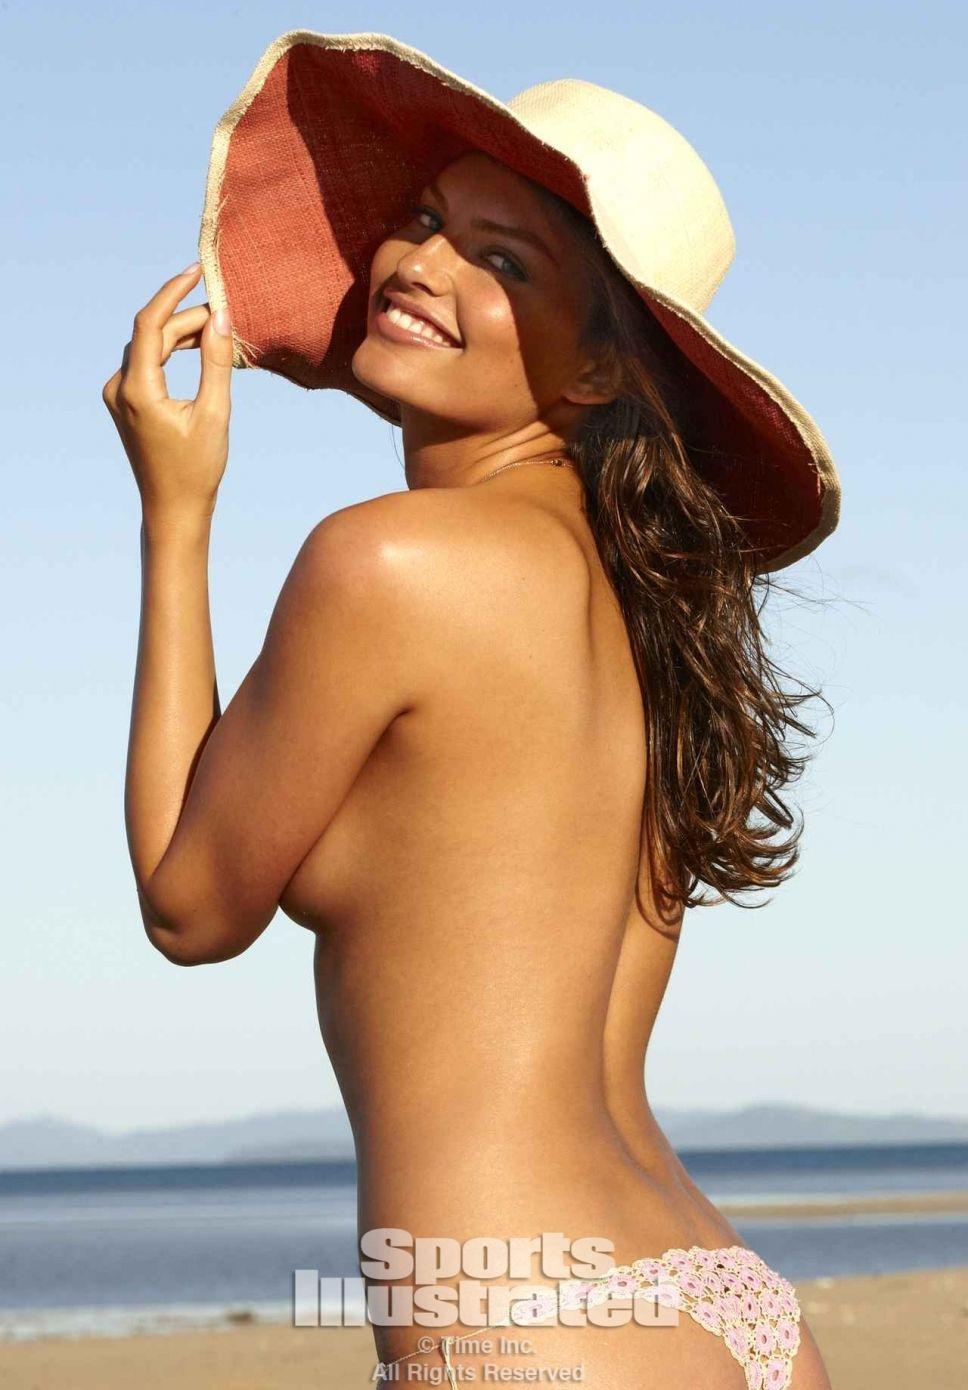 Carre Otis topless. 2018-2019 celebrityes photos leaks! naked (69 photo)